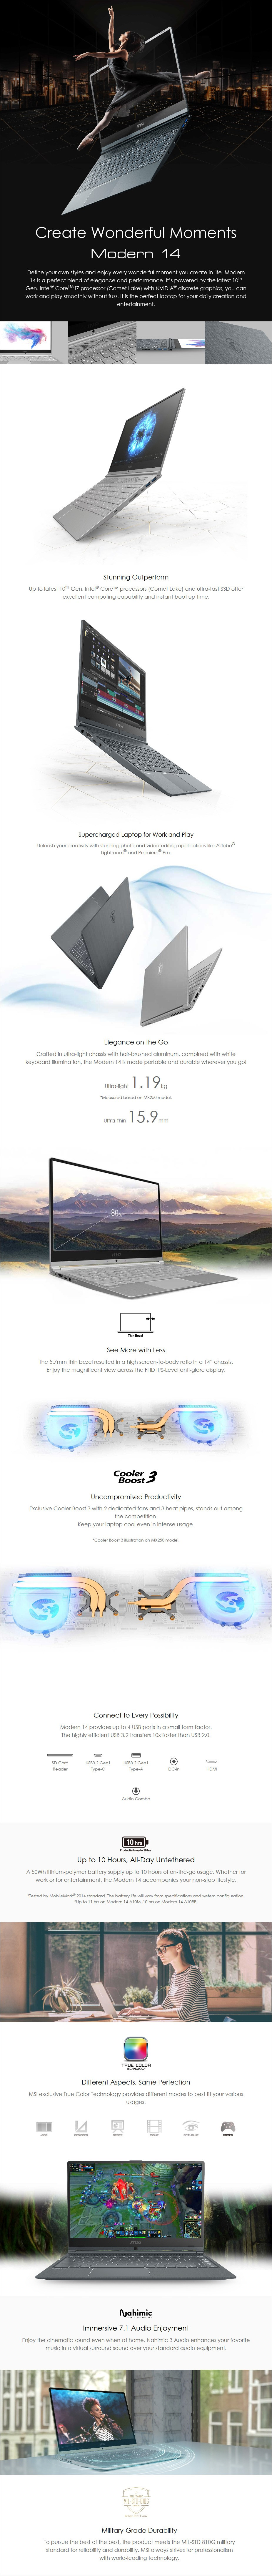 "MSI Modern 14 A10M 14"" Laptop i5-10210U 8GB 512GB SSD W10H - Overview 1"